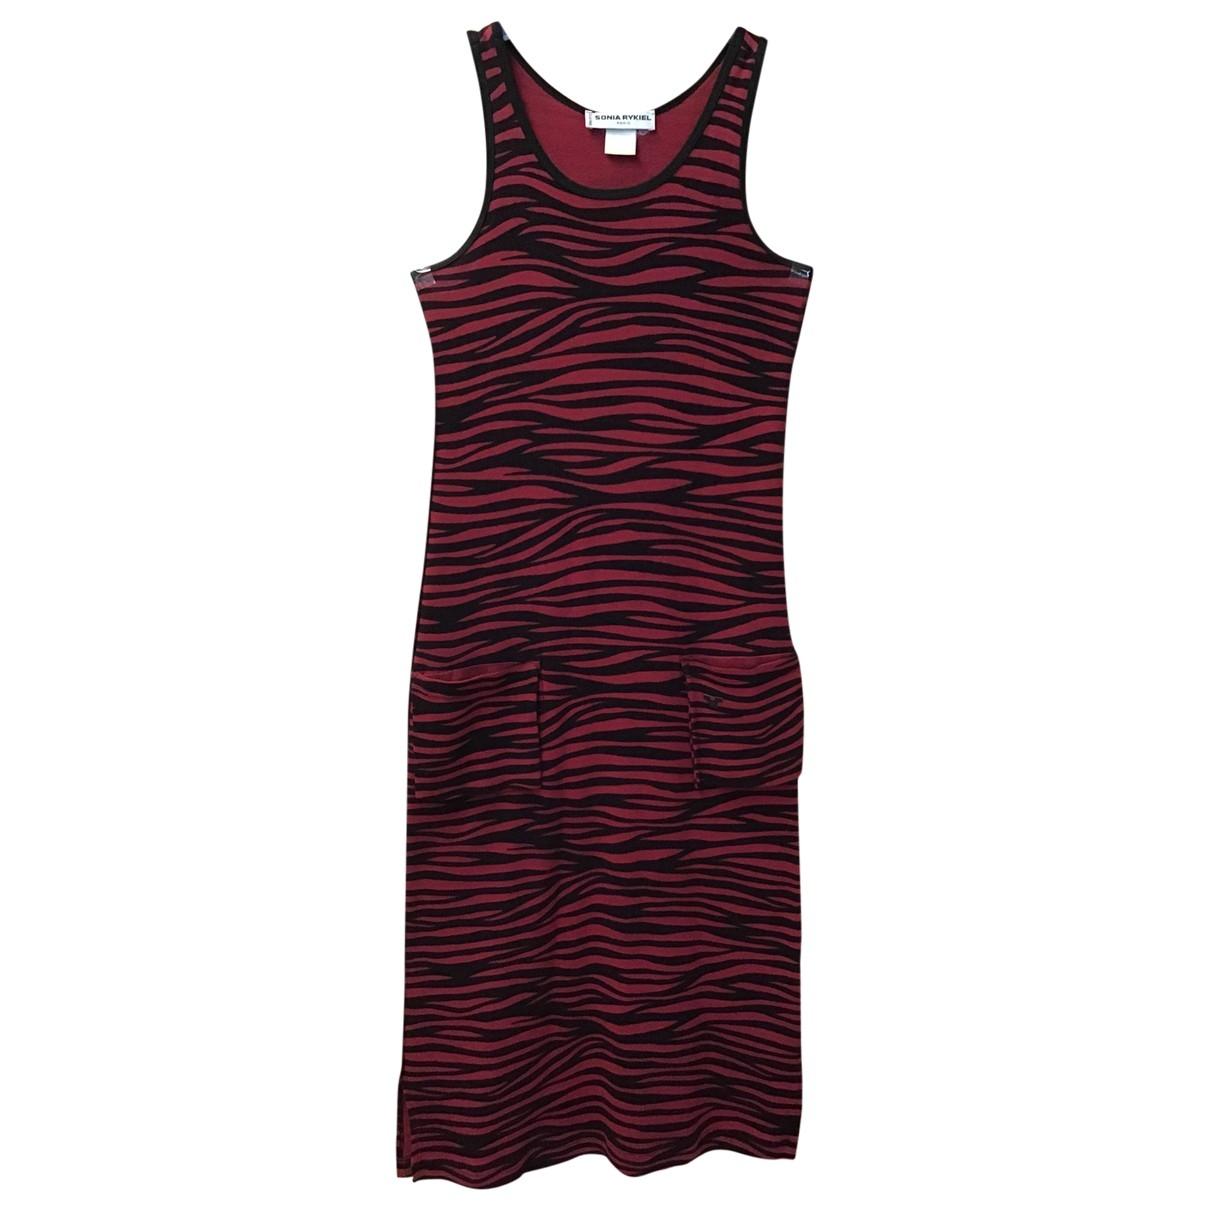 Sonia Rykiel \N Red Cotton dress for Women 36 FR